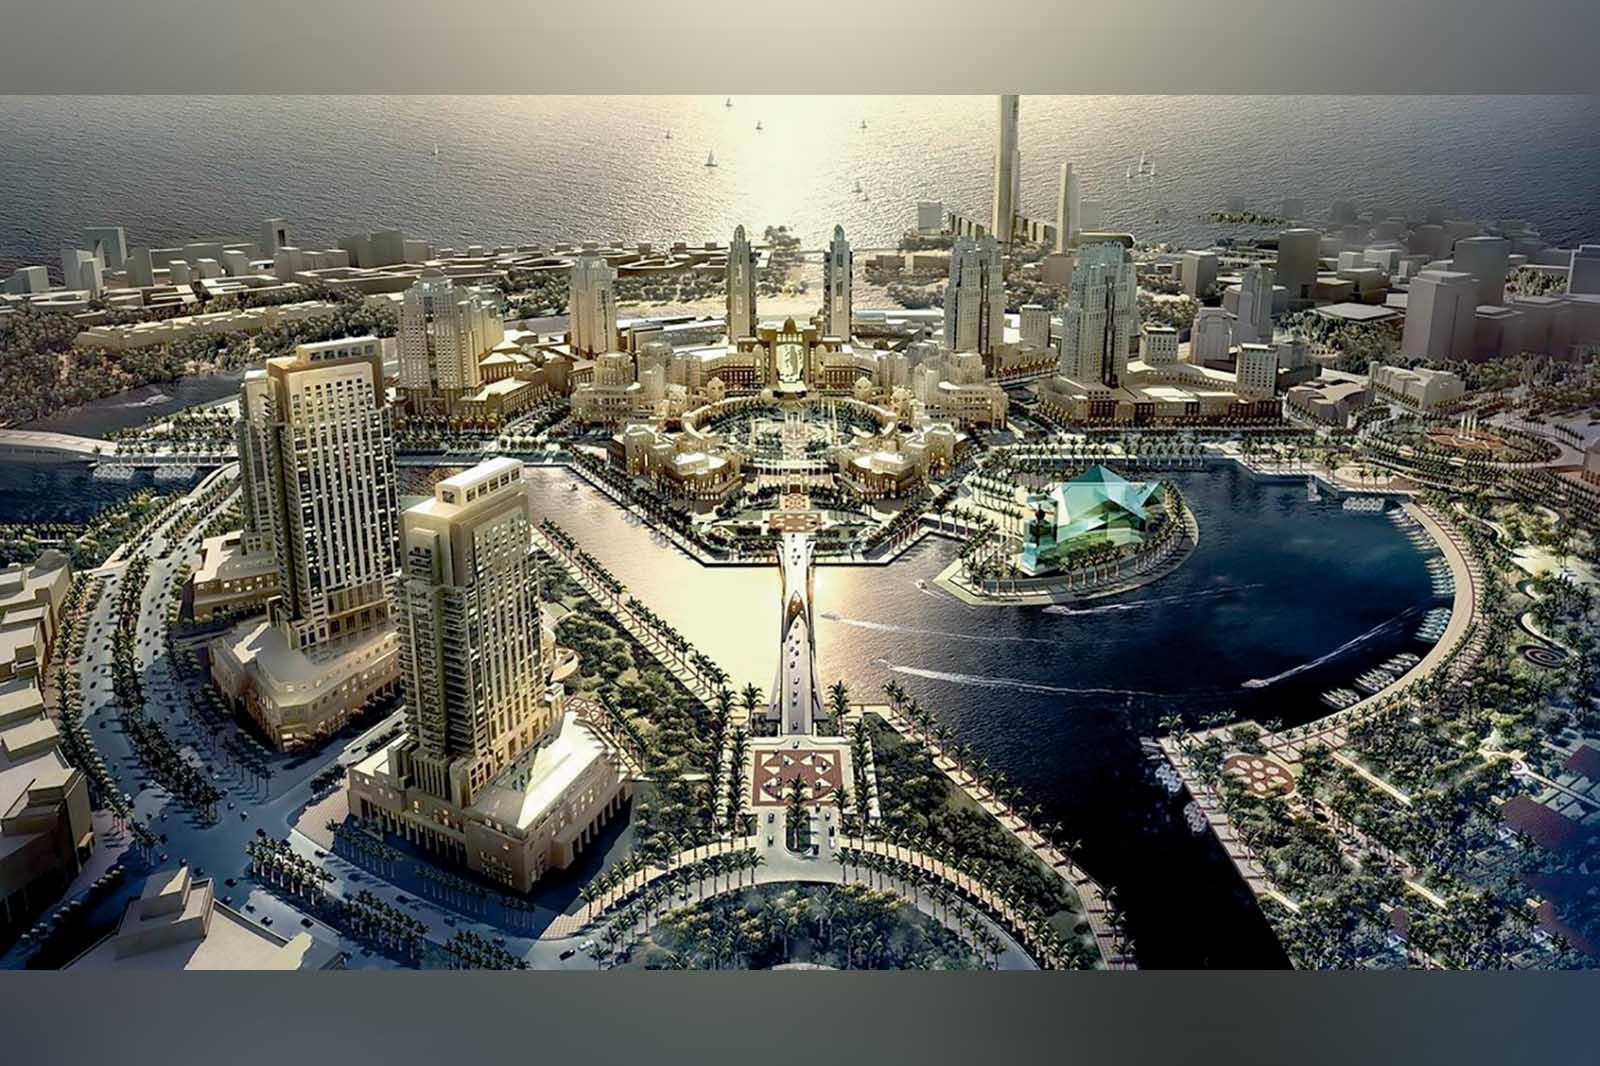 ОАЭ. Масдар — экологически чистый город